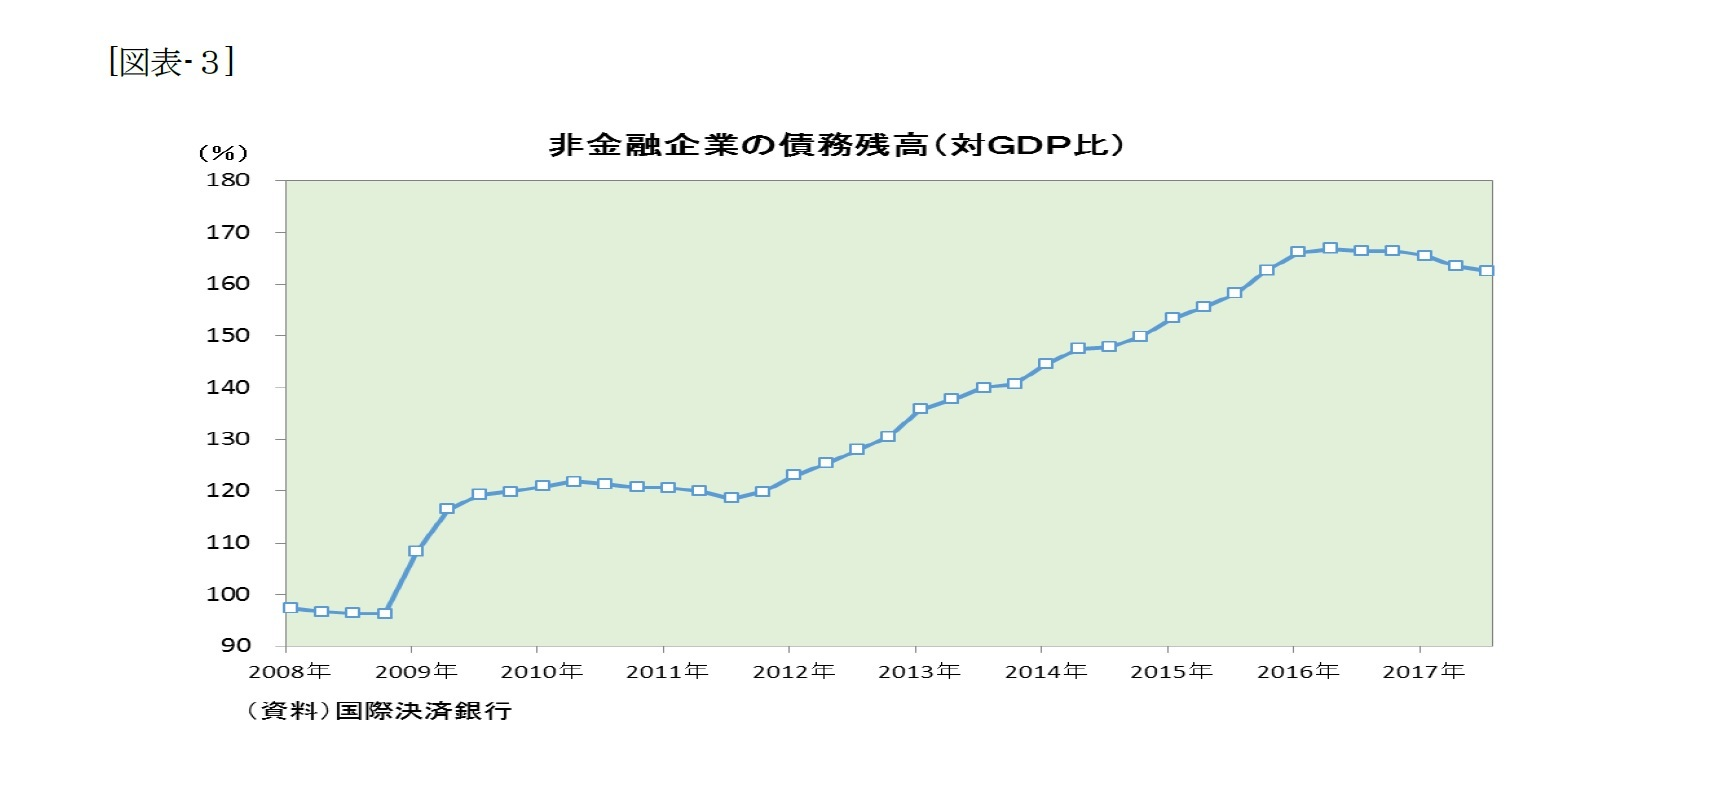 (図表-3)非金融企業の債務残高(対GDP比)